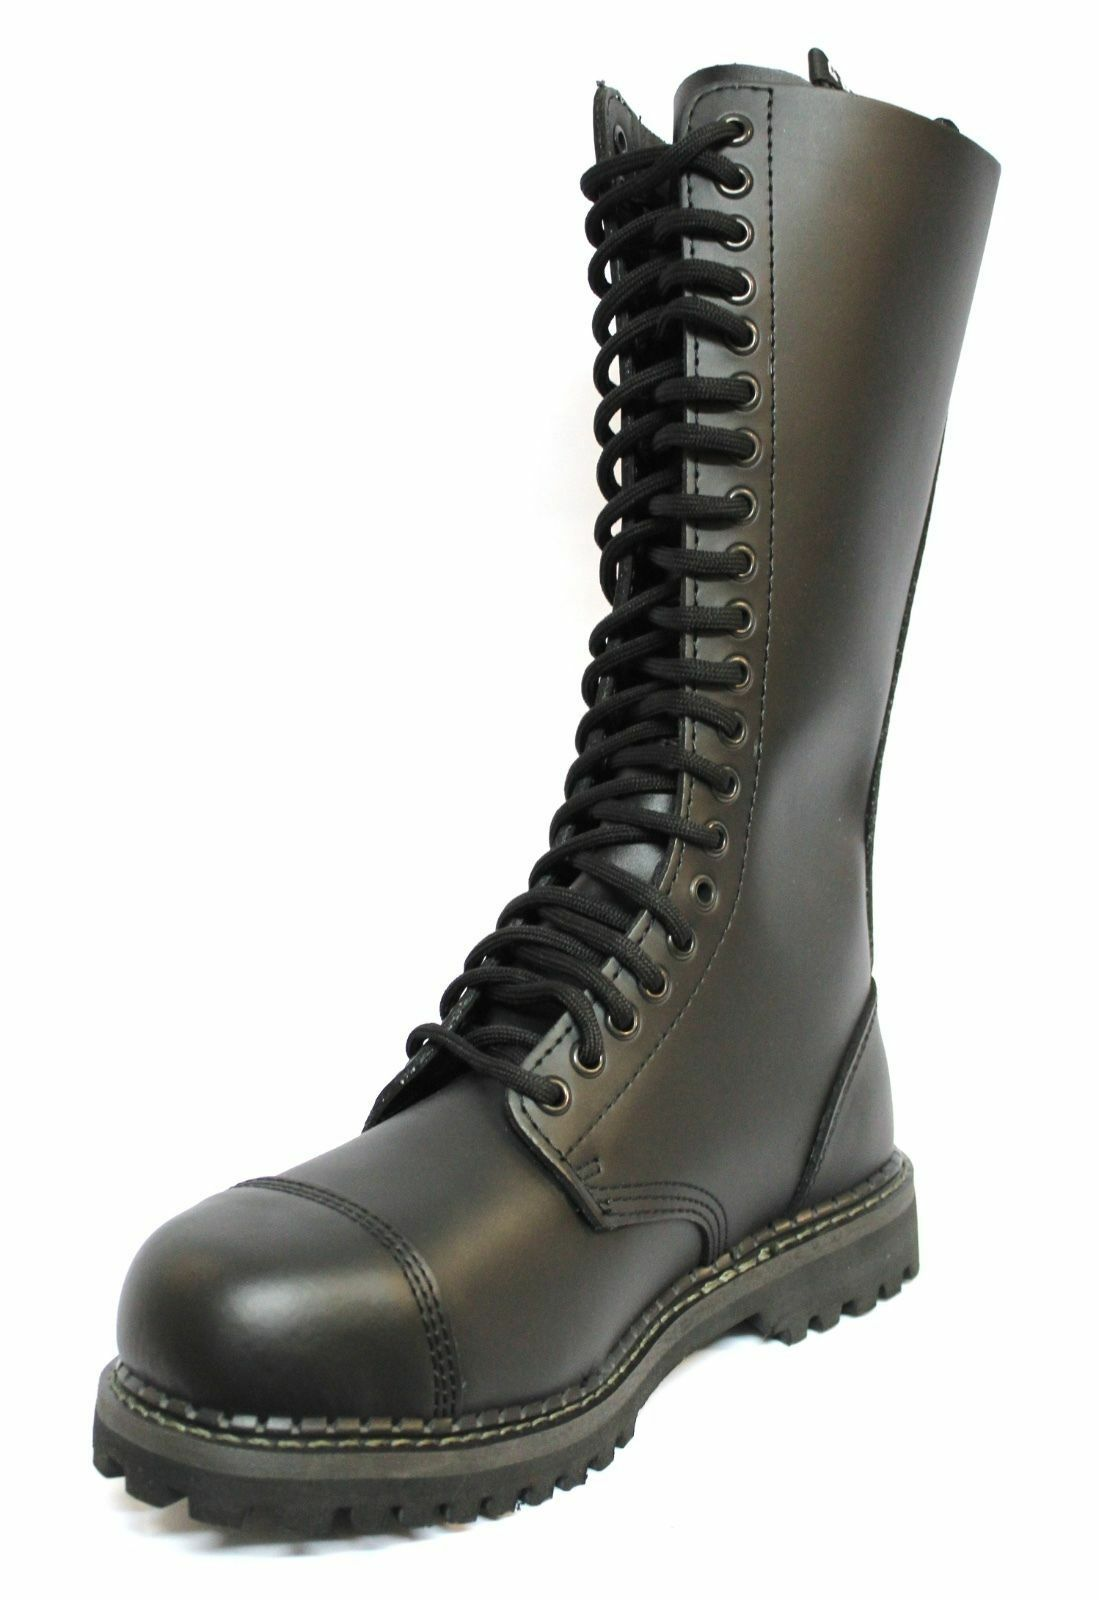 TRITATUTTO KING NERO UNISEX 20 Foro Toe High Ranger Leather Steel Toe Foro Cap Safety Boot 480935